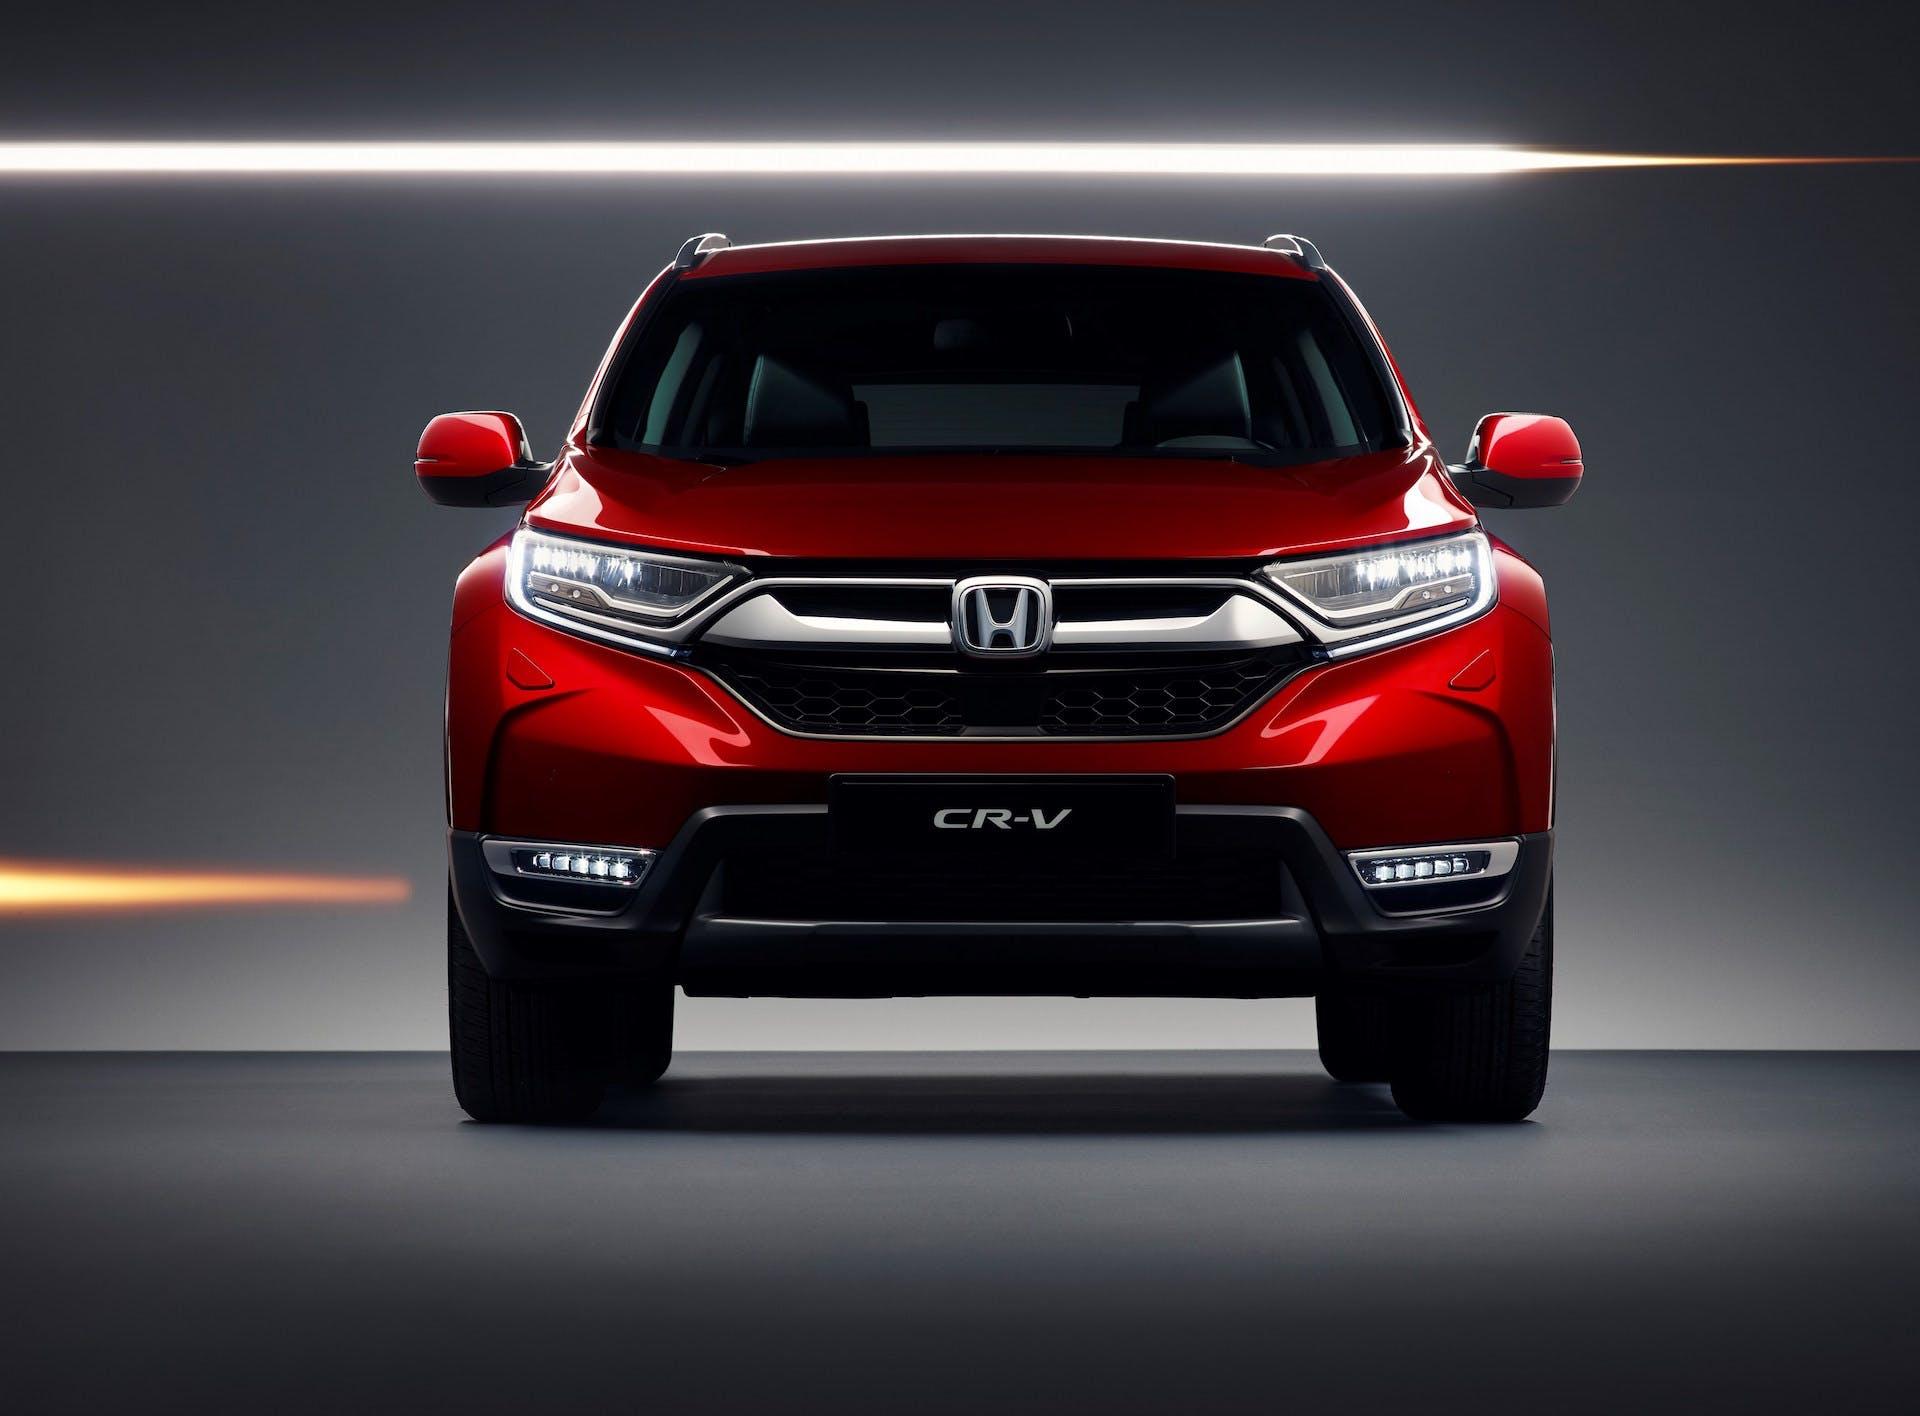 Honda CR-V frontale rosso